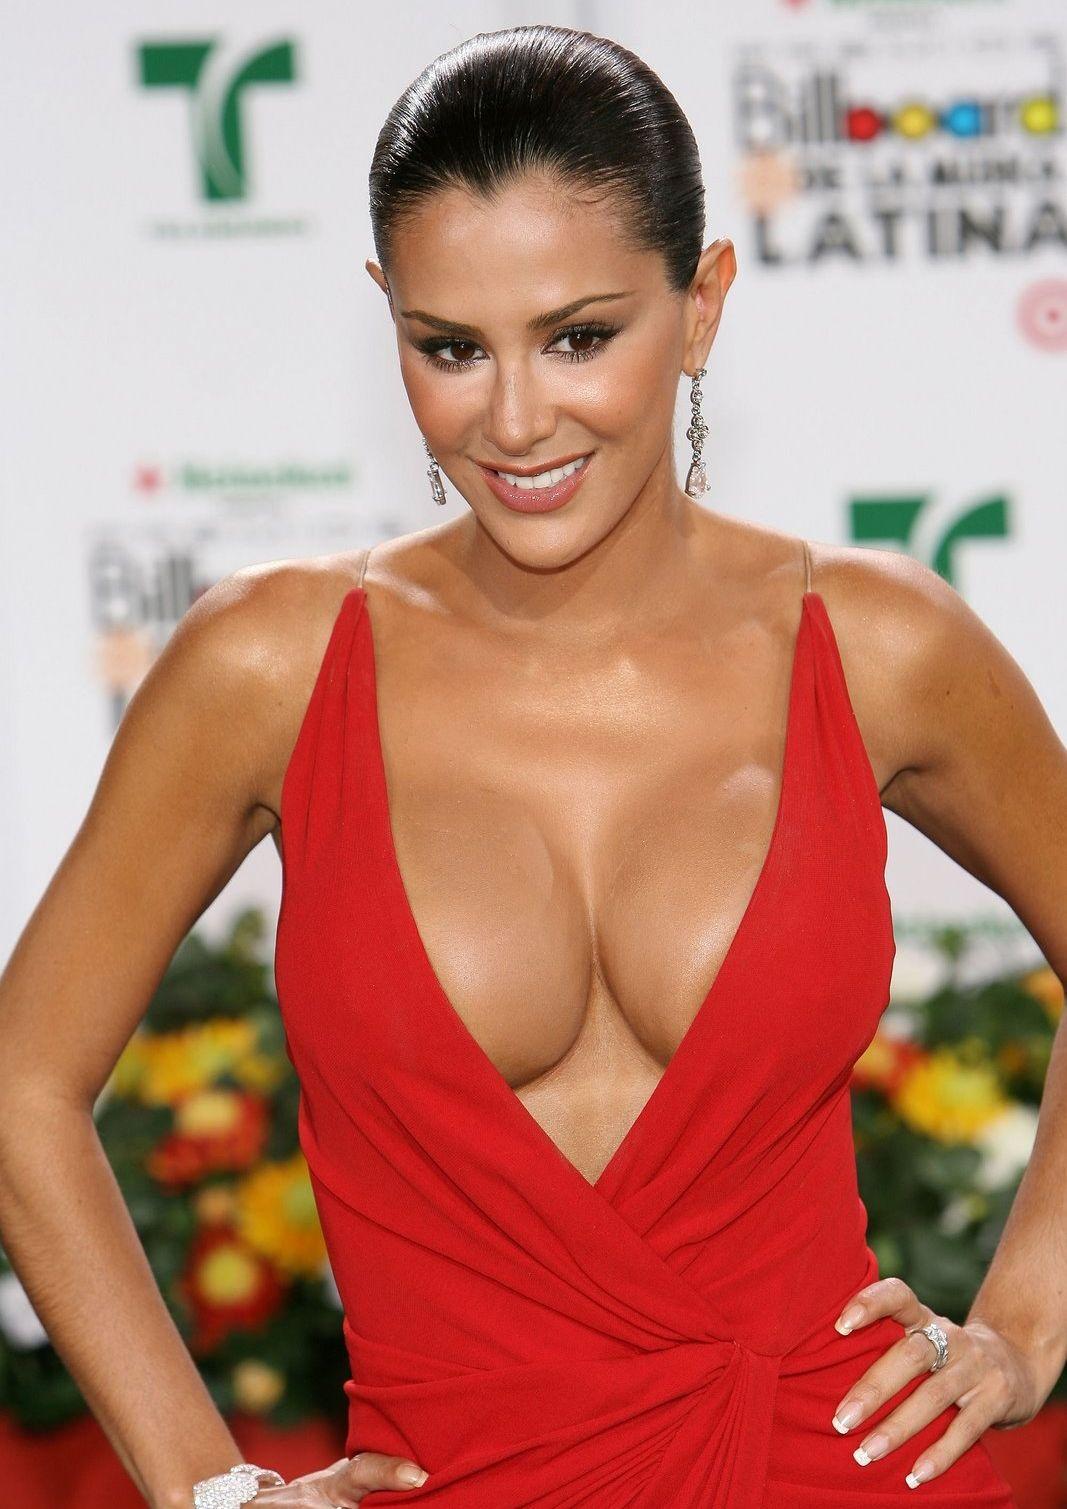 Jenni Rivera Tits Delightful cleavage - google search | nice boobs | pinterest | boobs, sofia